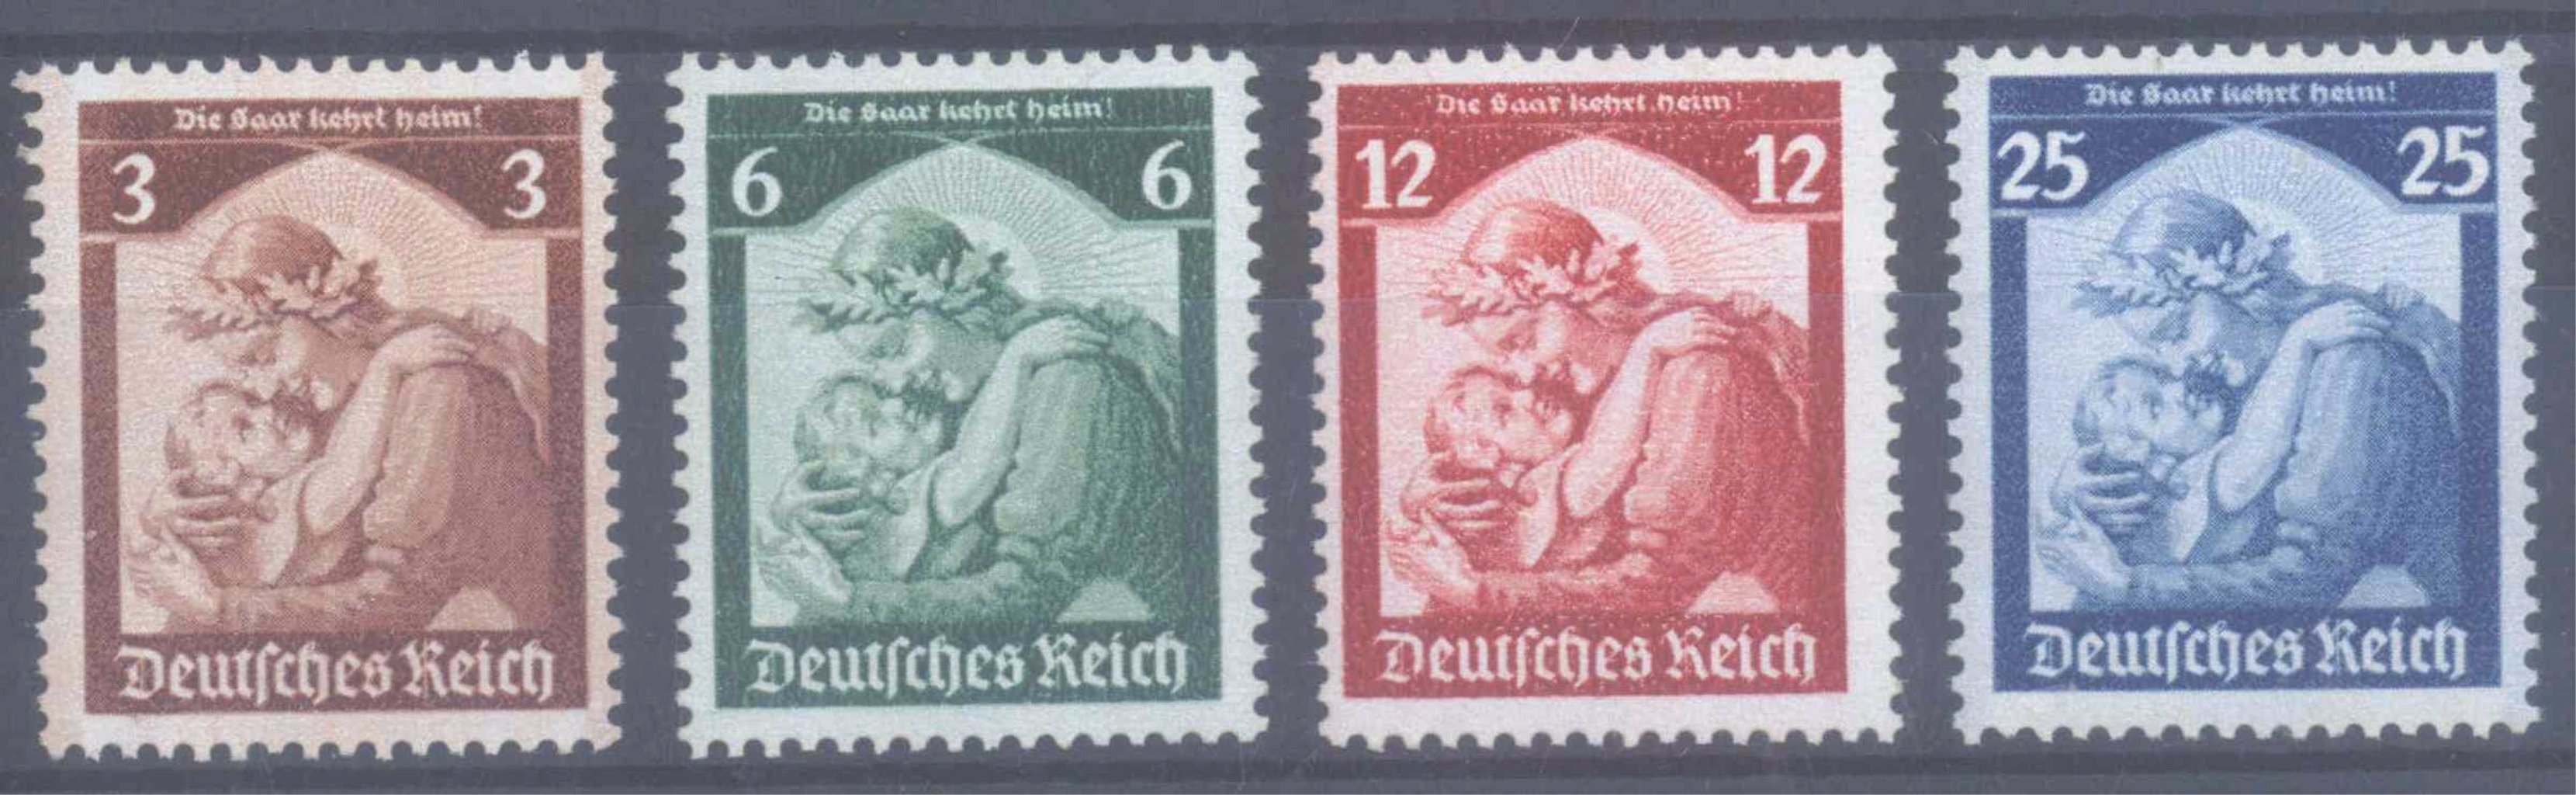 1935 III. REICH, Saar